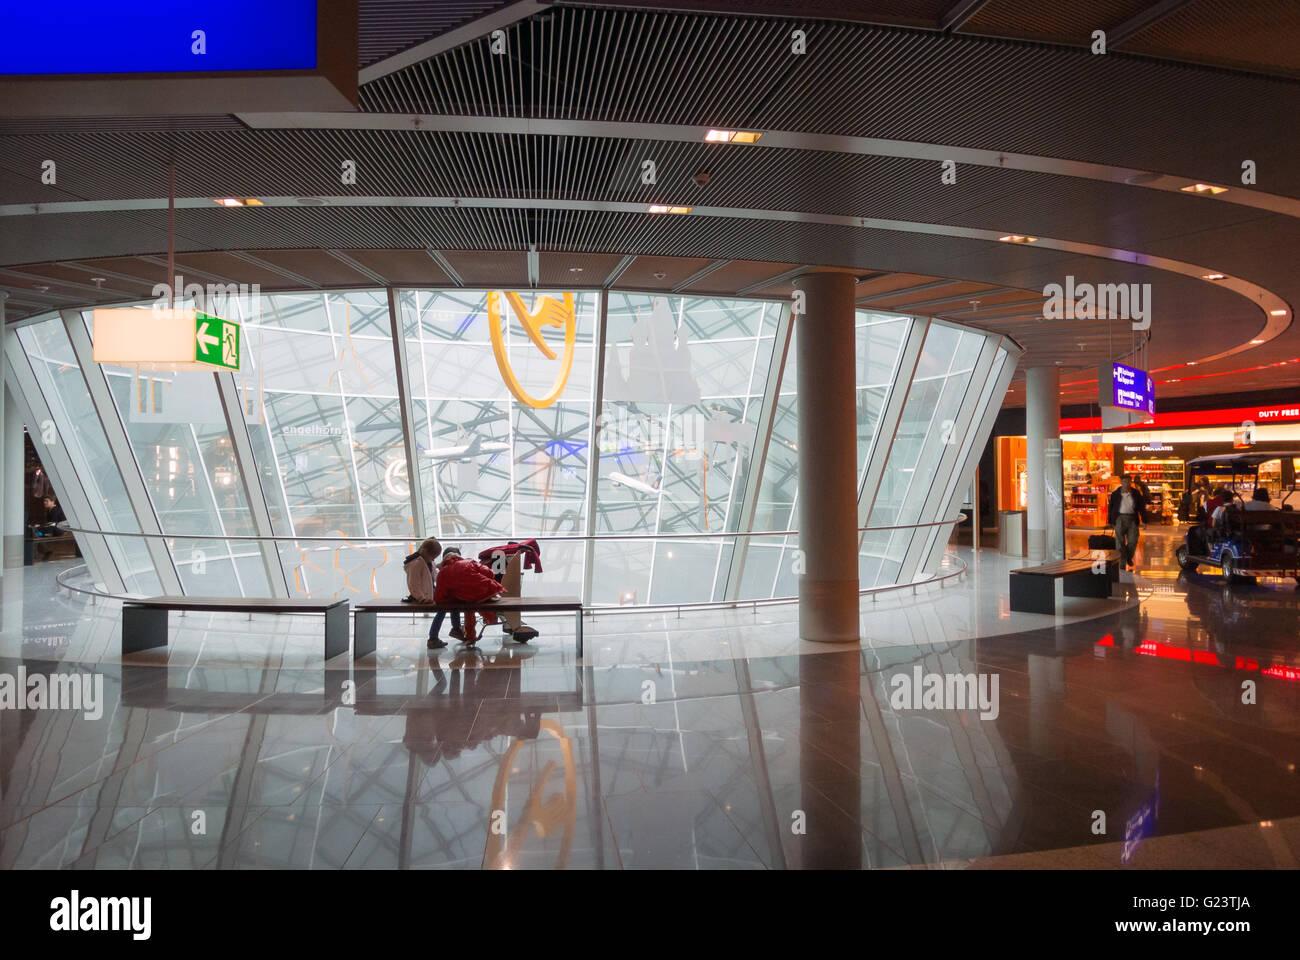 Frankfurt Airport, Germany.  Flughafen Frankfurt am Main, Passengers wait in the departure area. - Stock Image